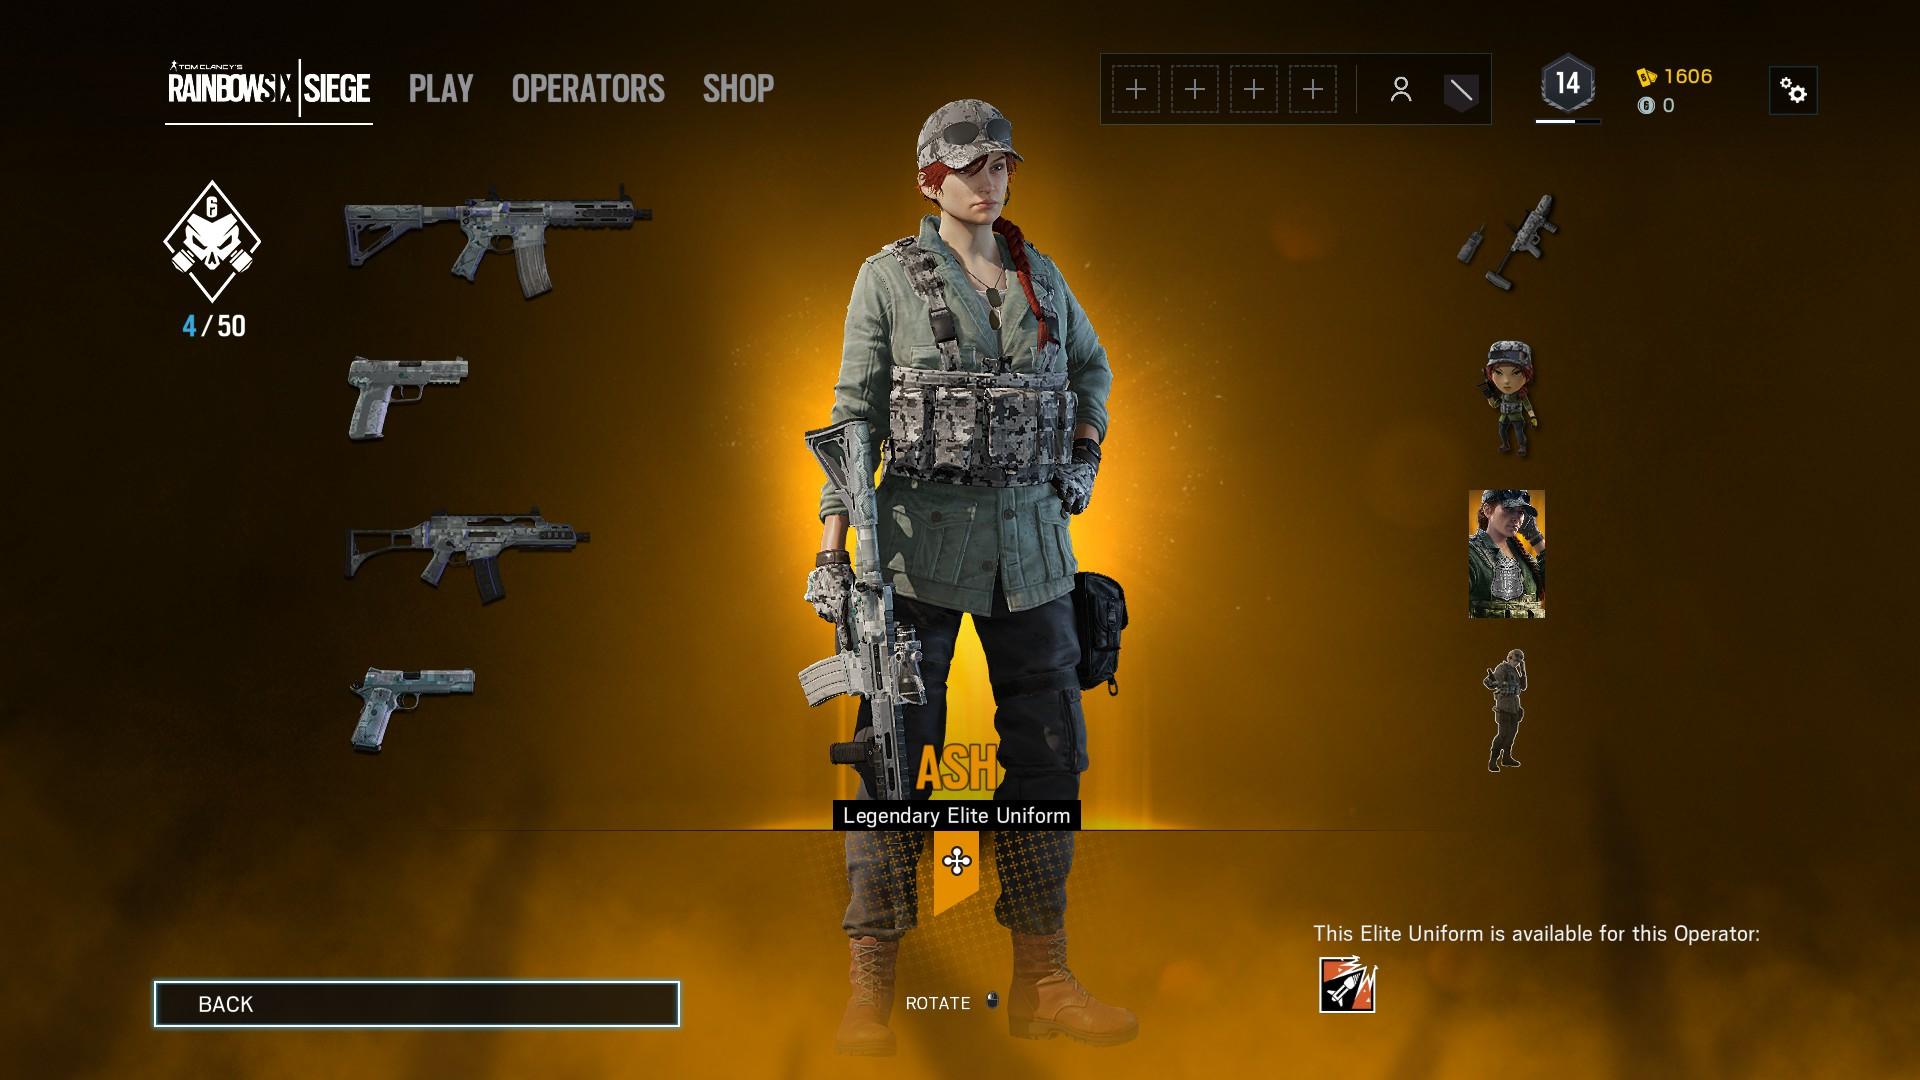 How to Equip Elite Skins in Rainbow Six Siege | Shacknews